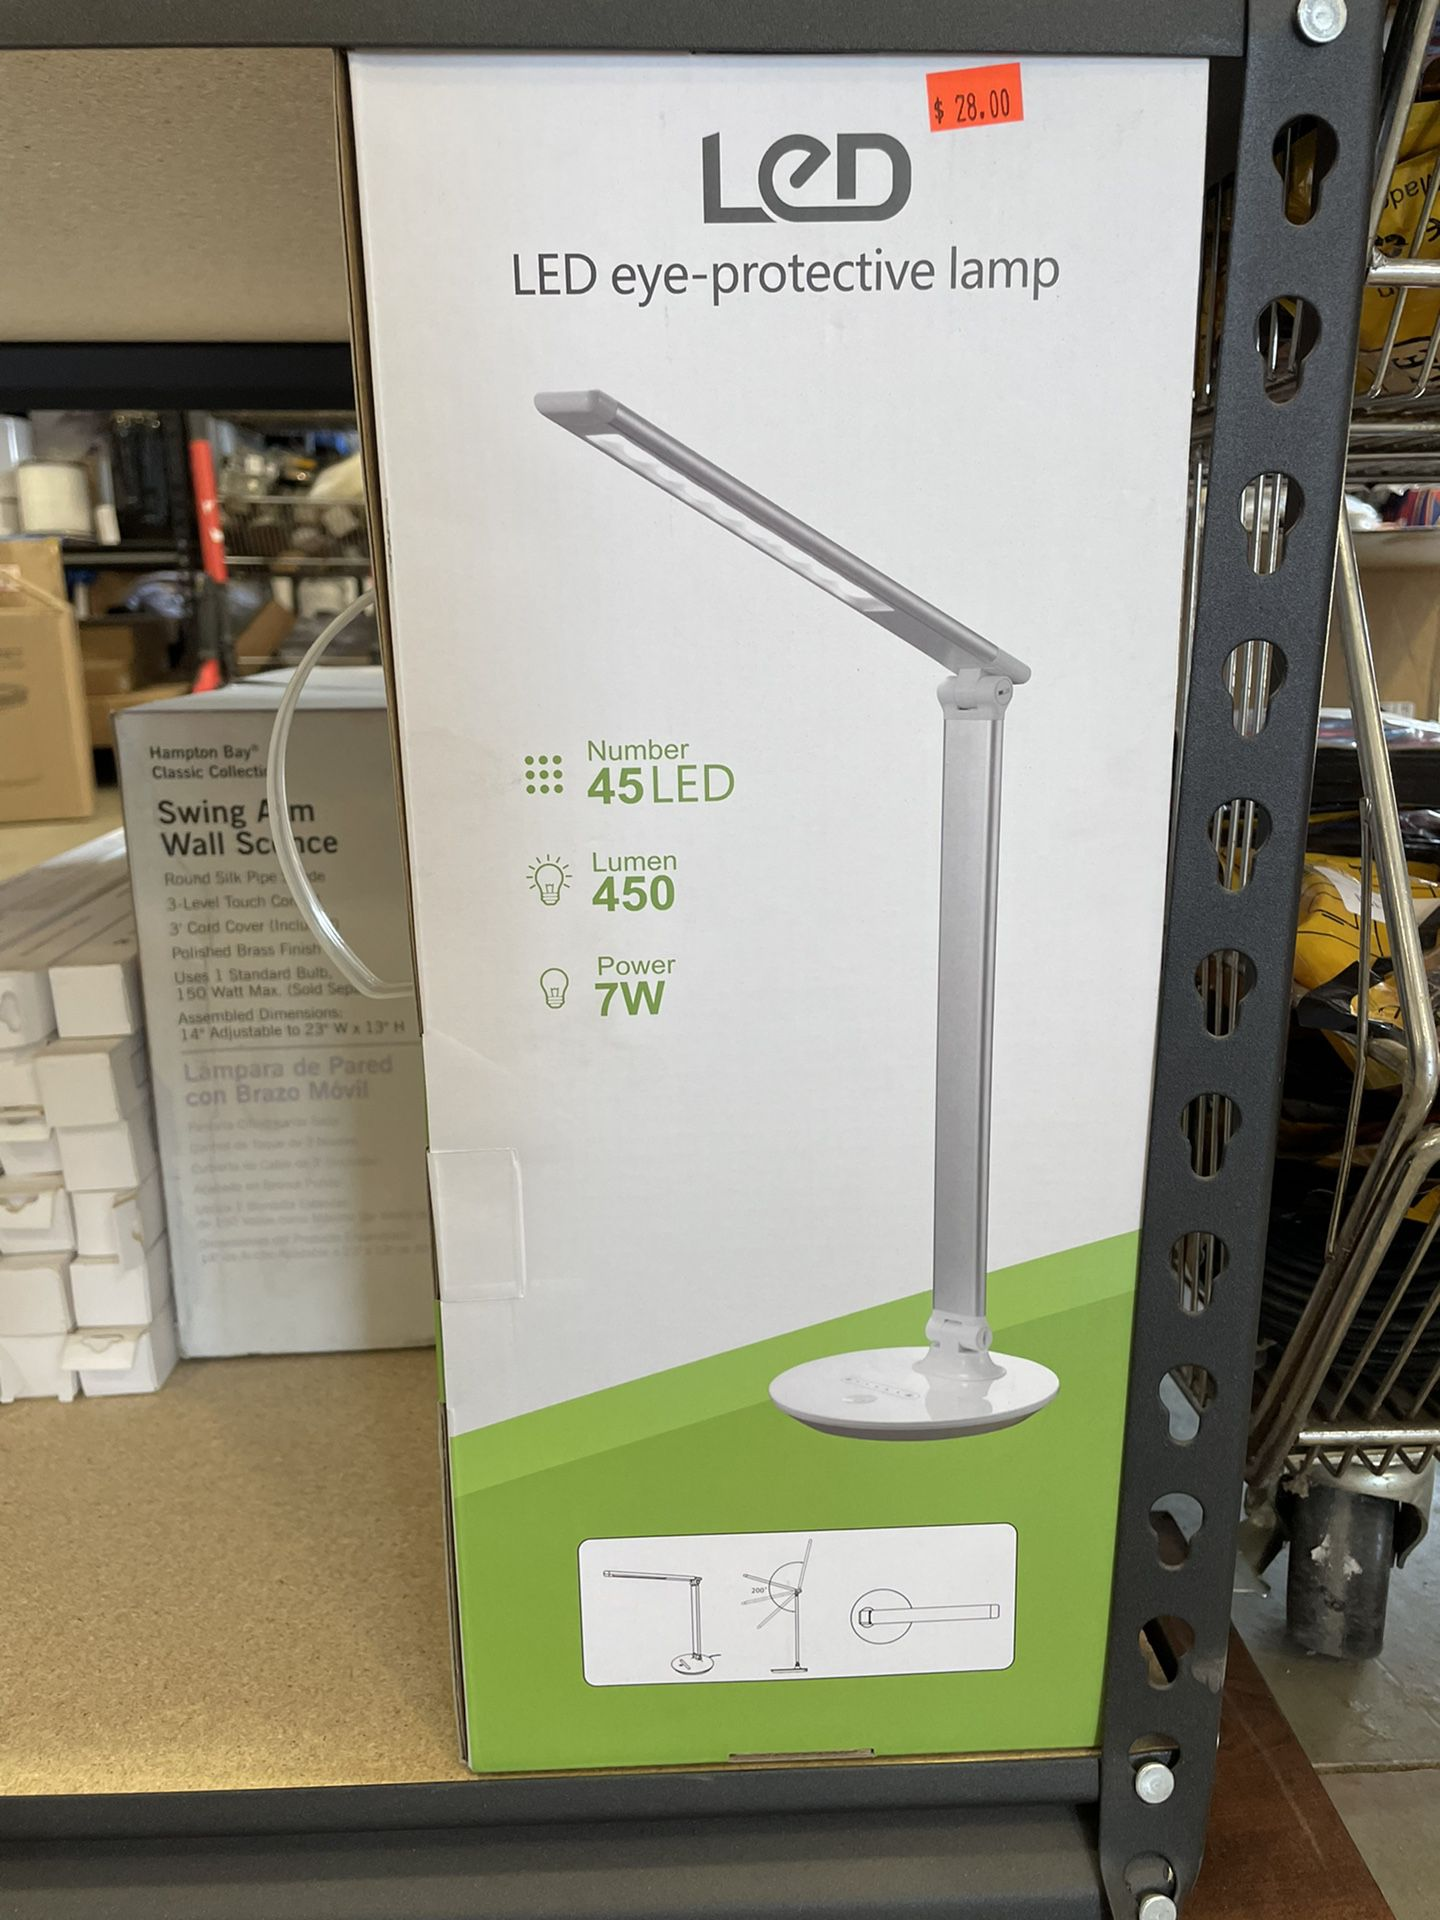 LES Eye protective Lamp $28